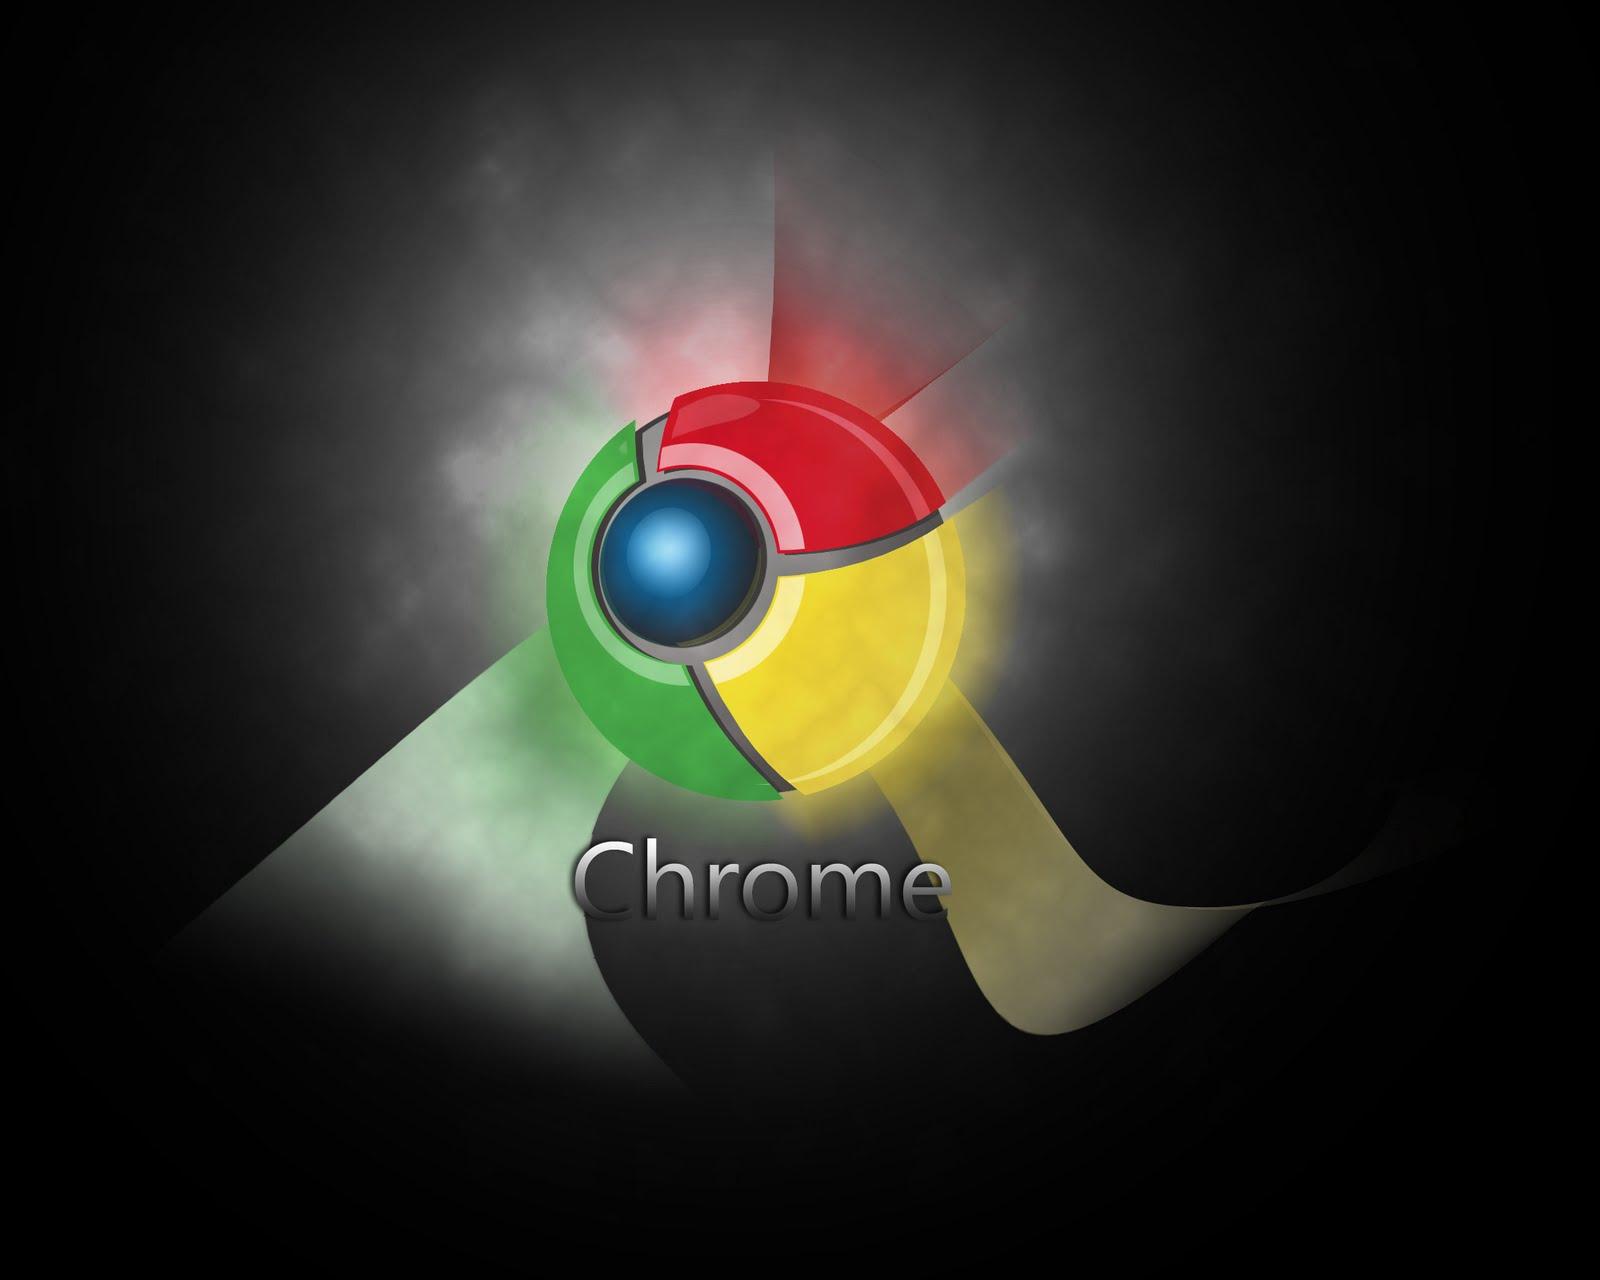 Wallpaper Naruto Google Chrome | New hd wallon